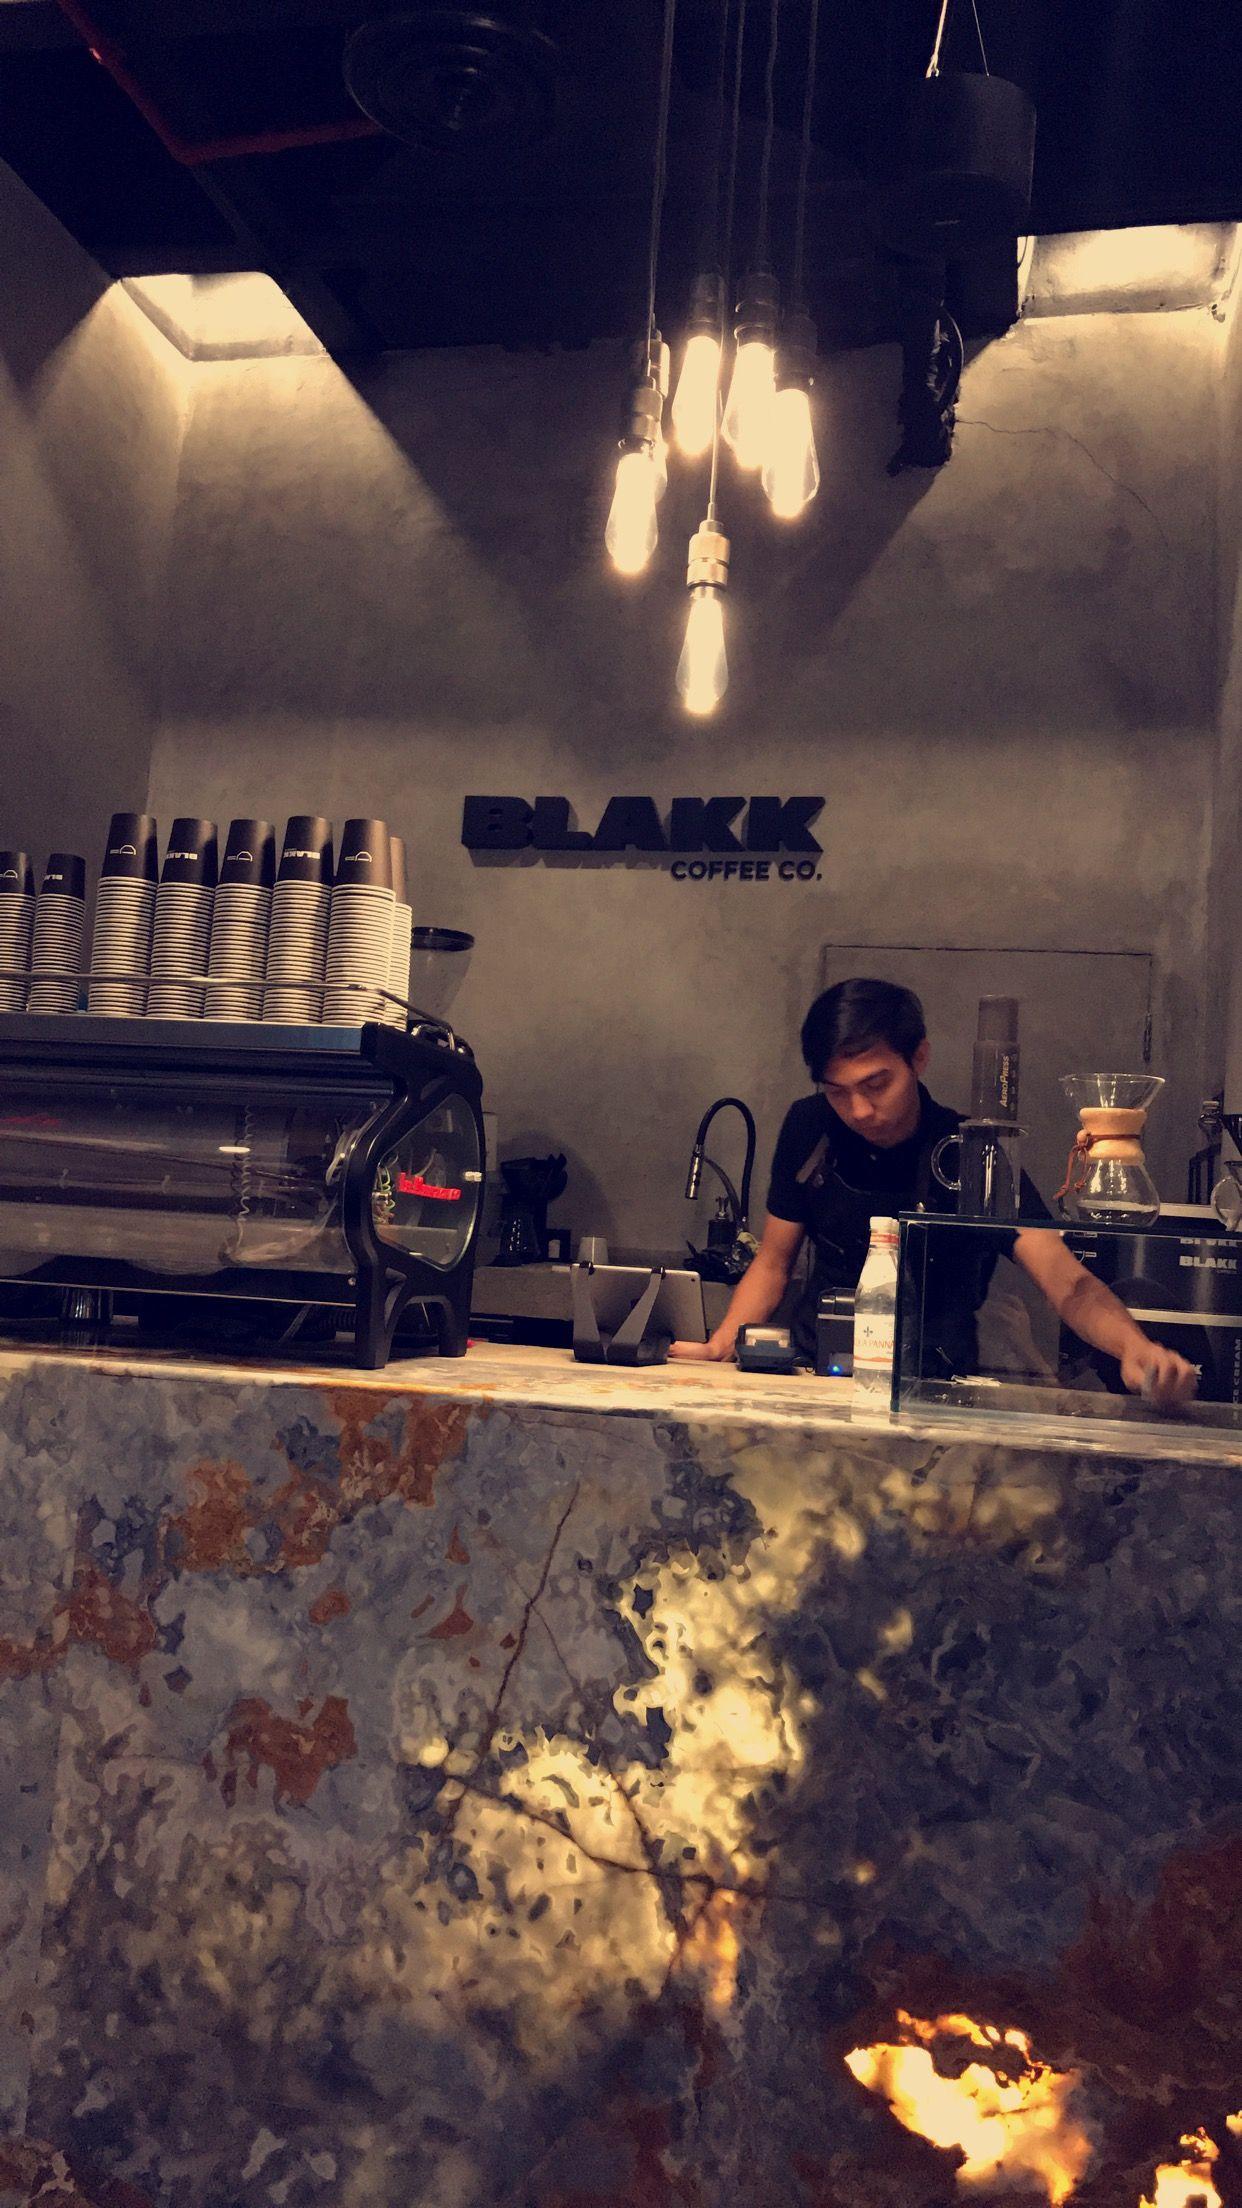 Blakk Coffee Co Kuwait City Kuwait Kuwait City Kuwait City